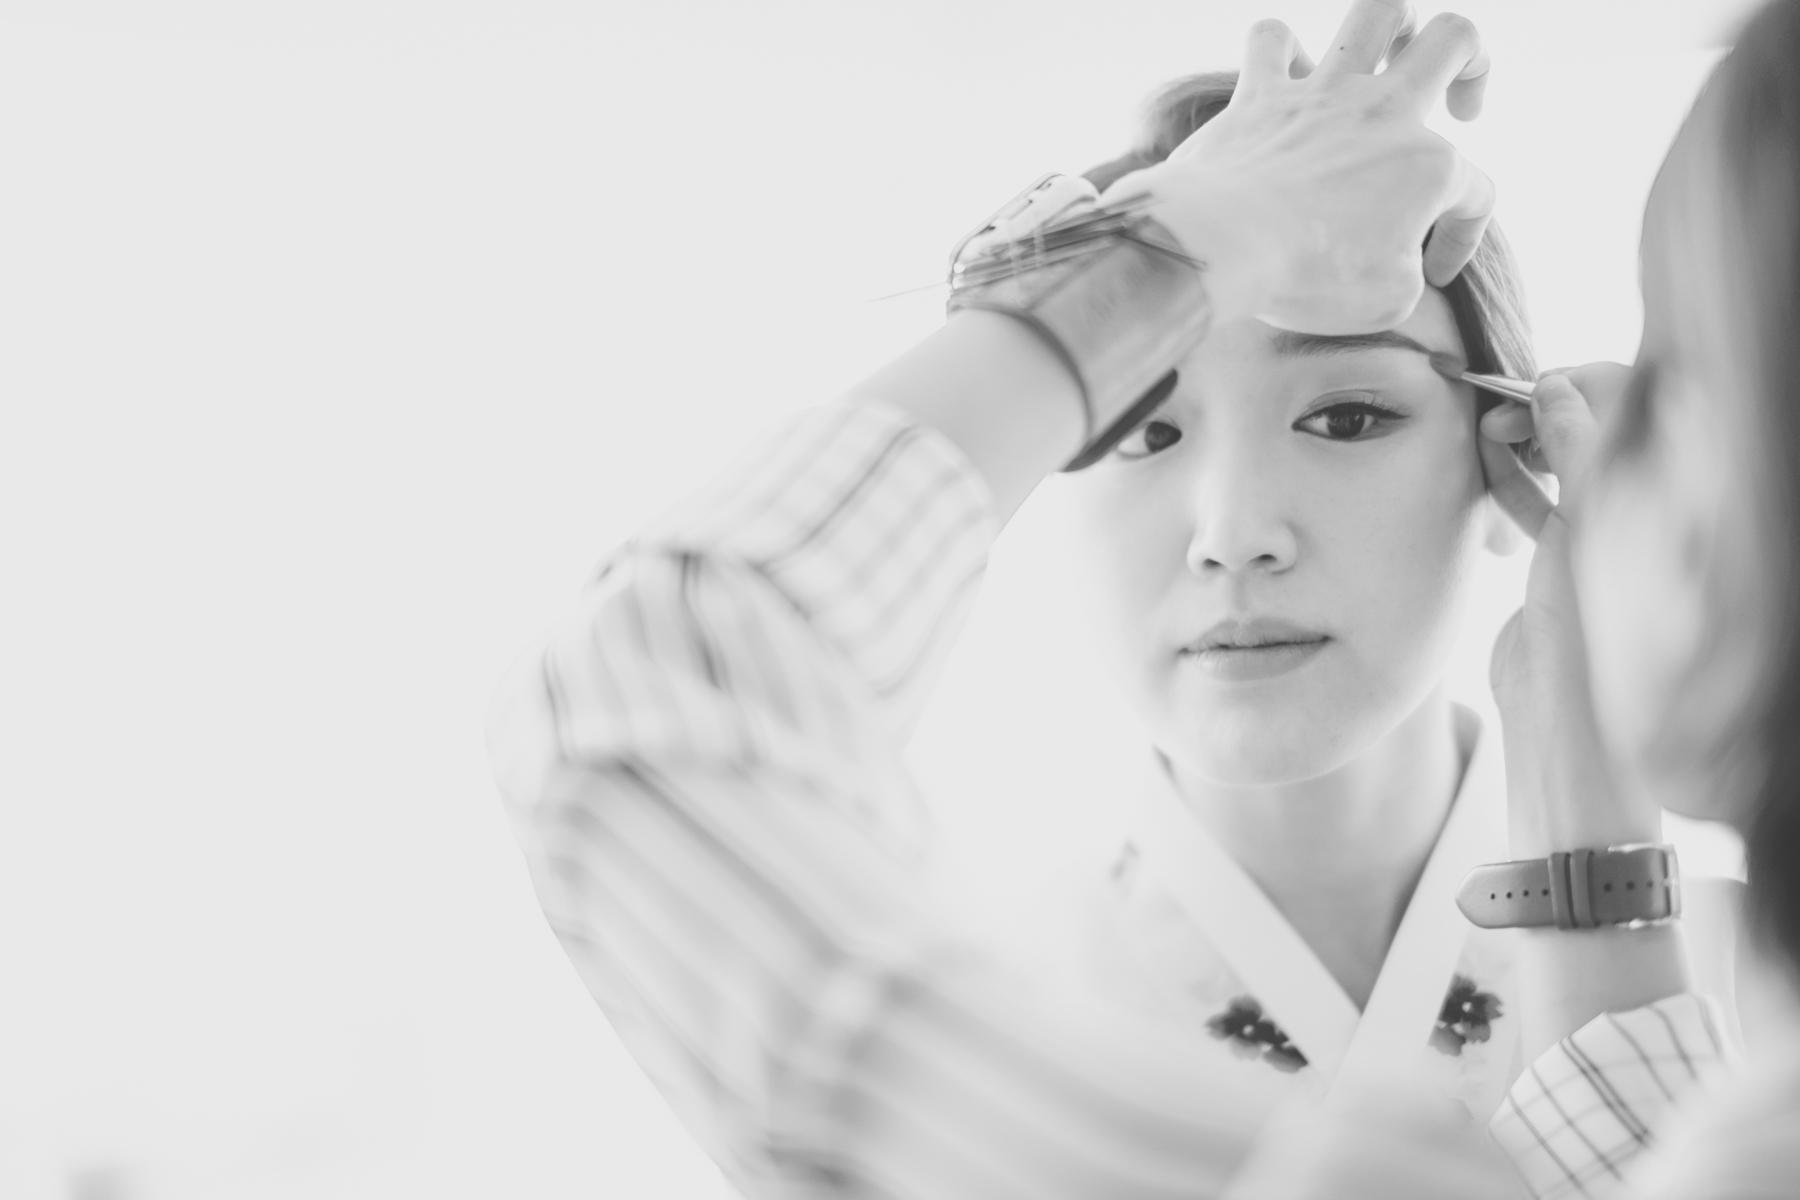 justlimphoto-sungminray-5891.jpg